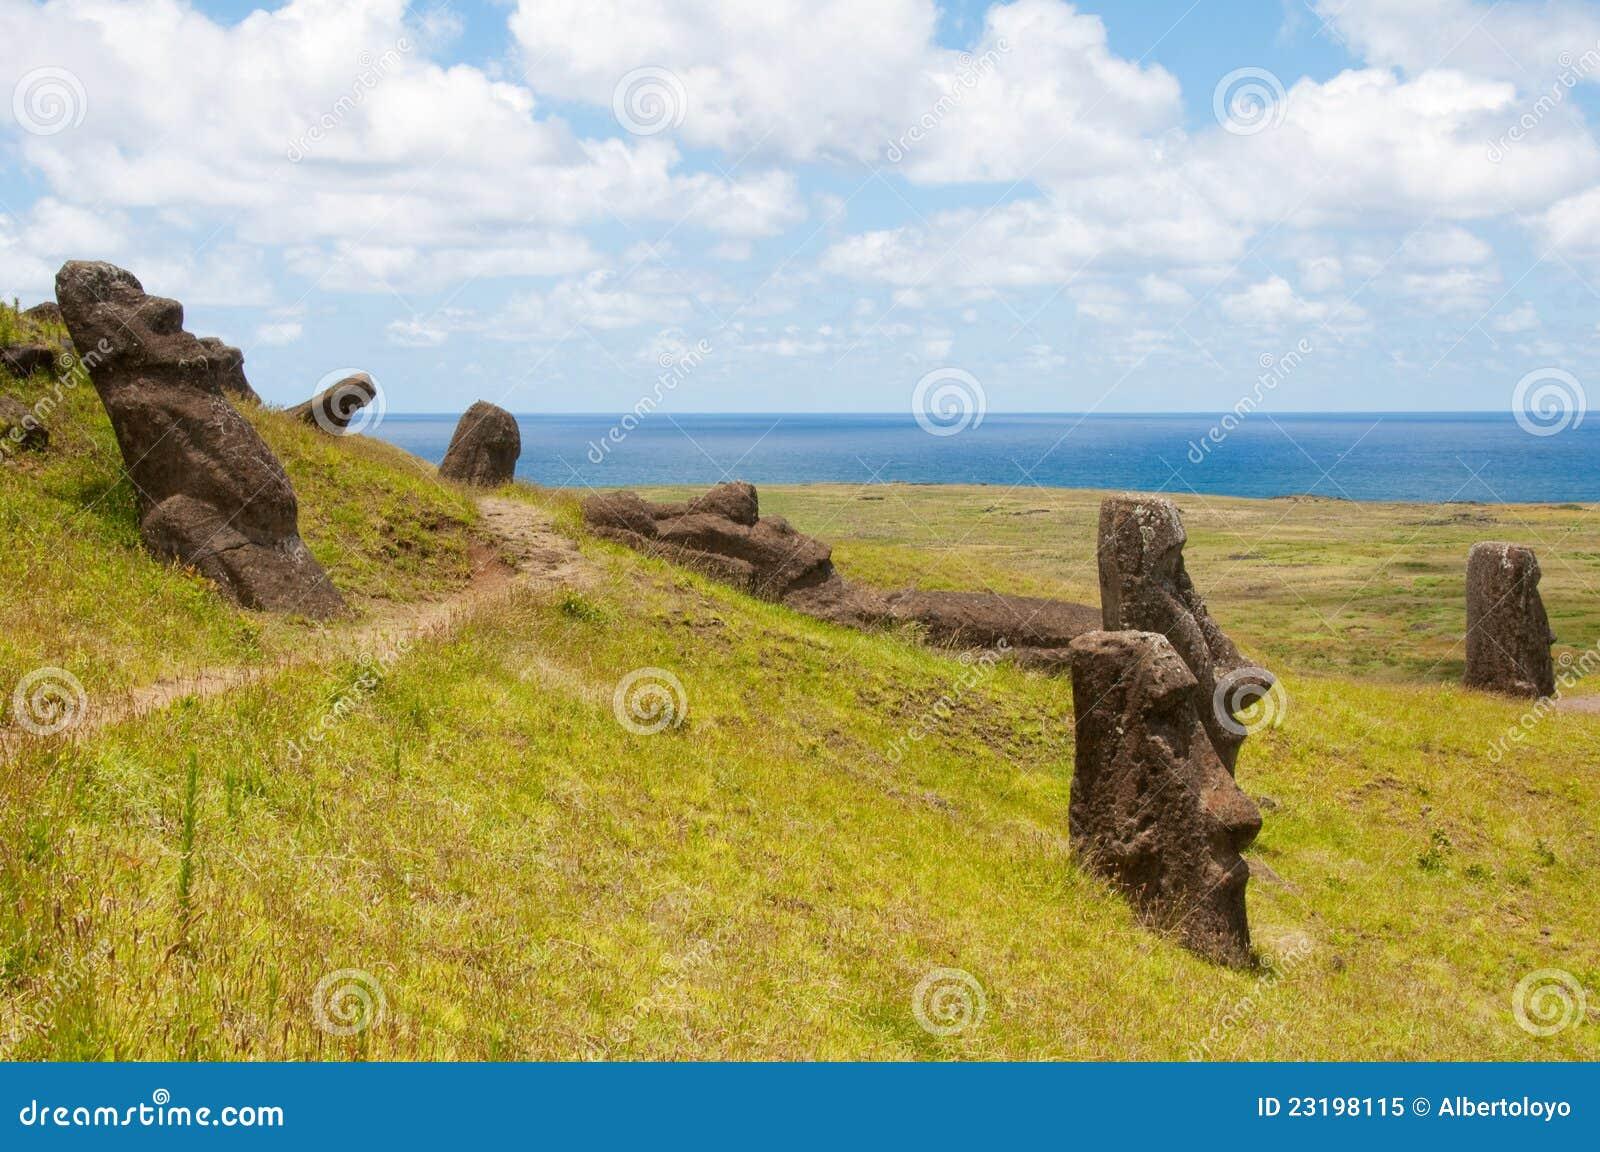 Moais at Rano Raraku, Easter island (Chile